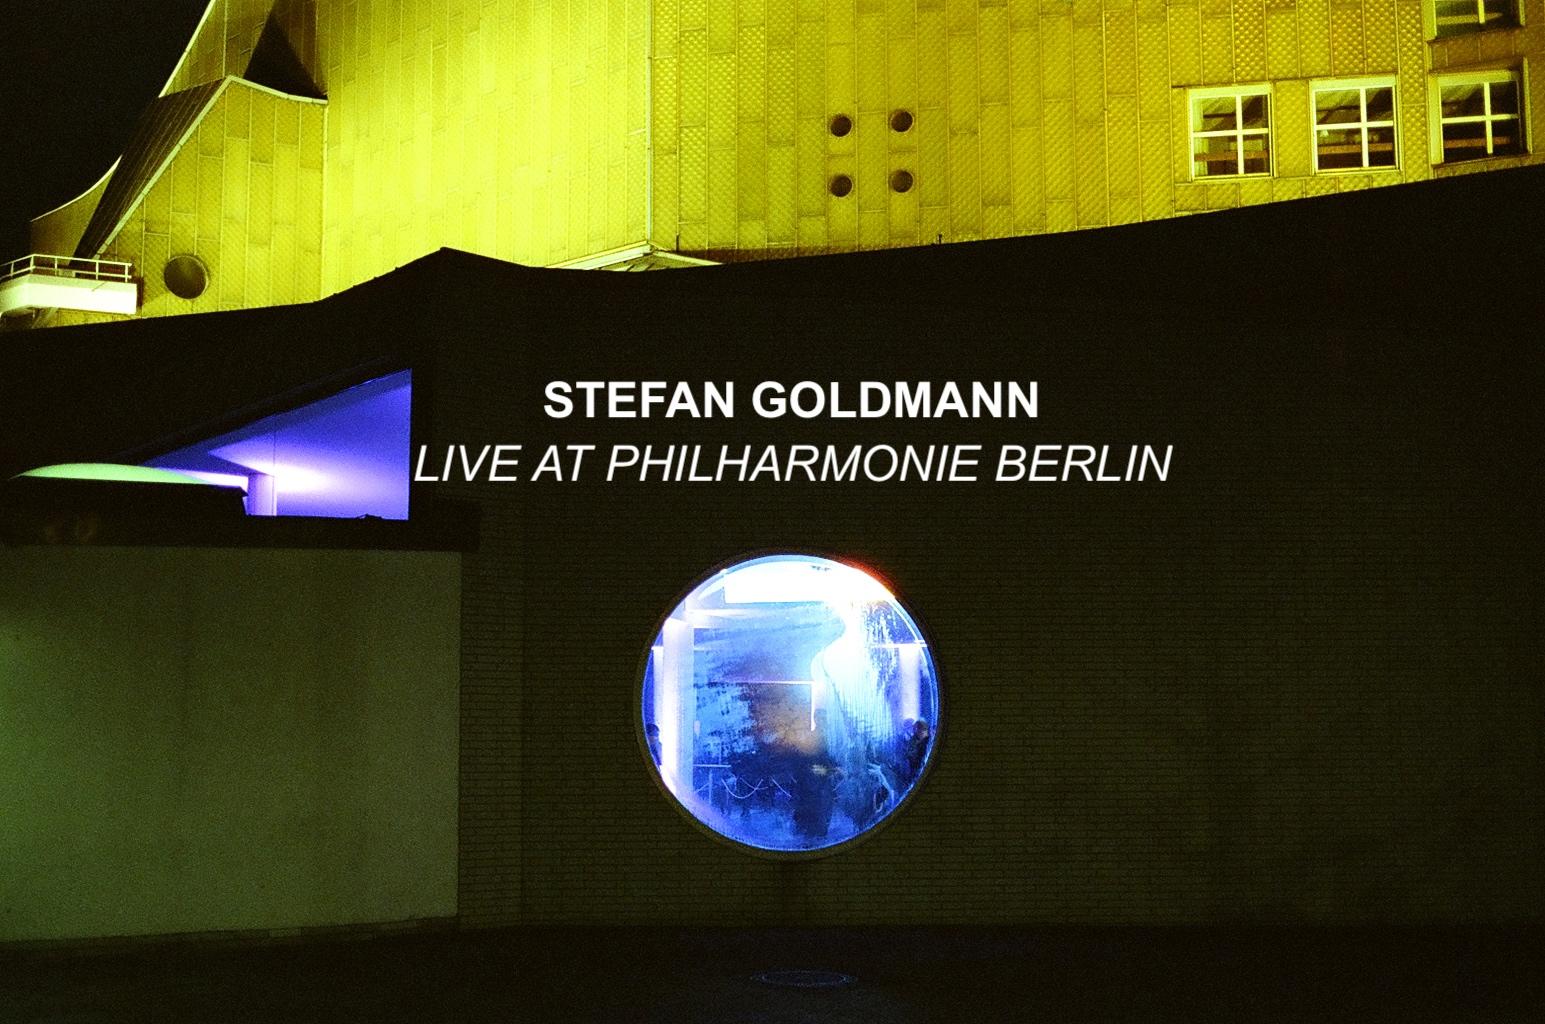 sg live at philharmonie berlin